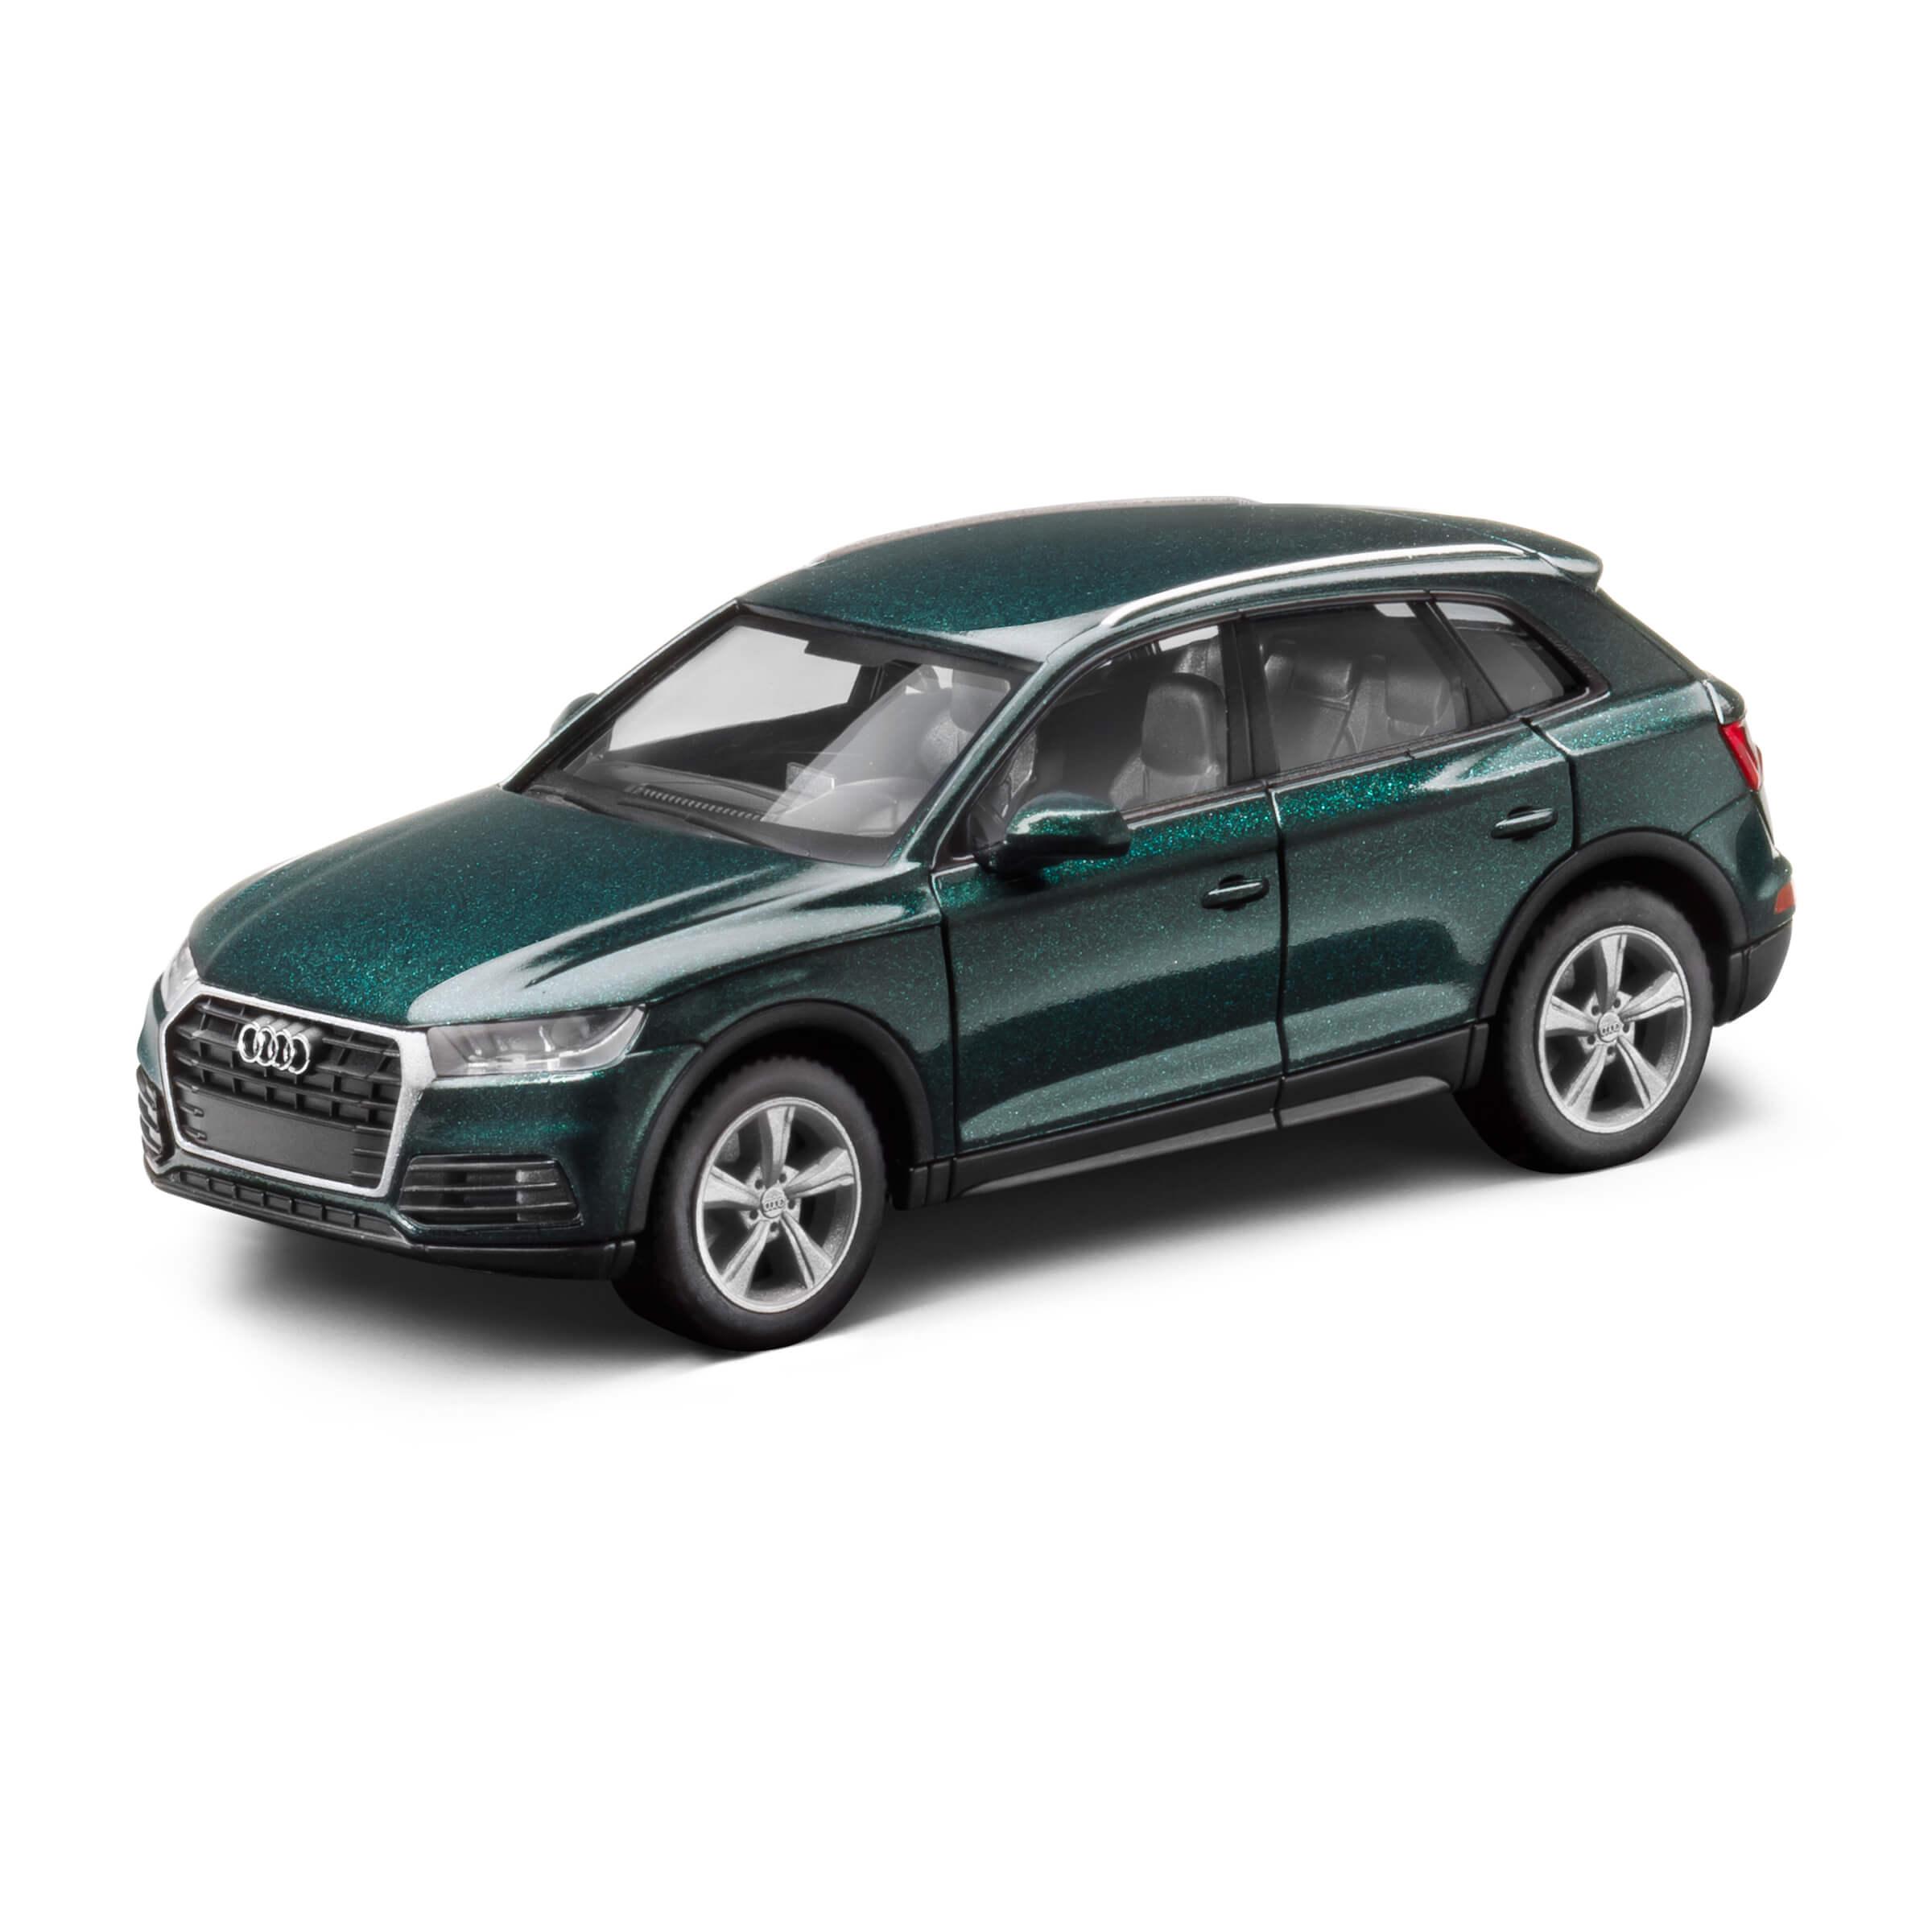 Audi Q5 Azorengrün Modellauto 1:87